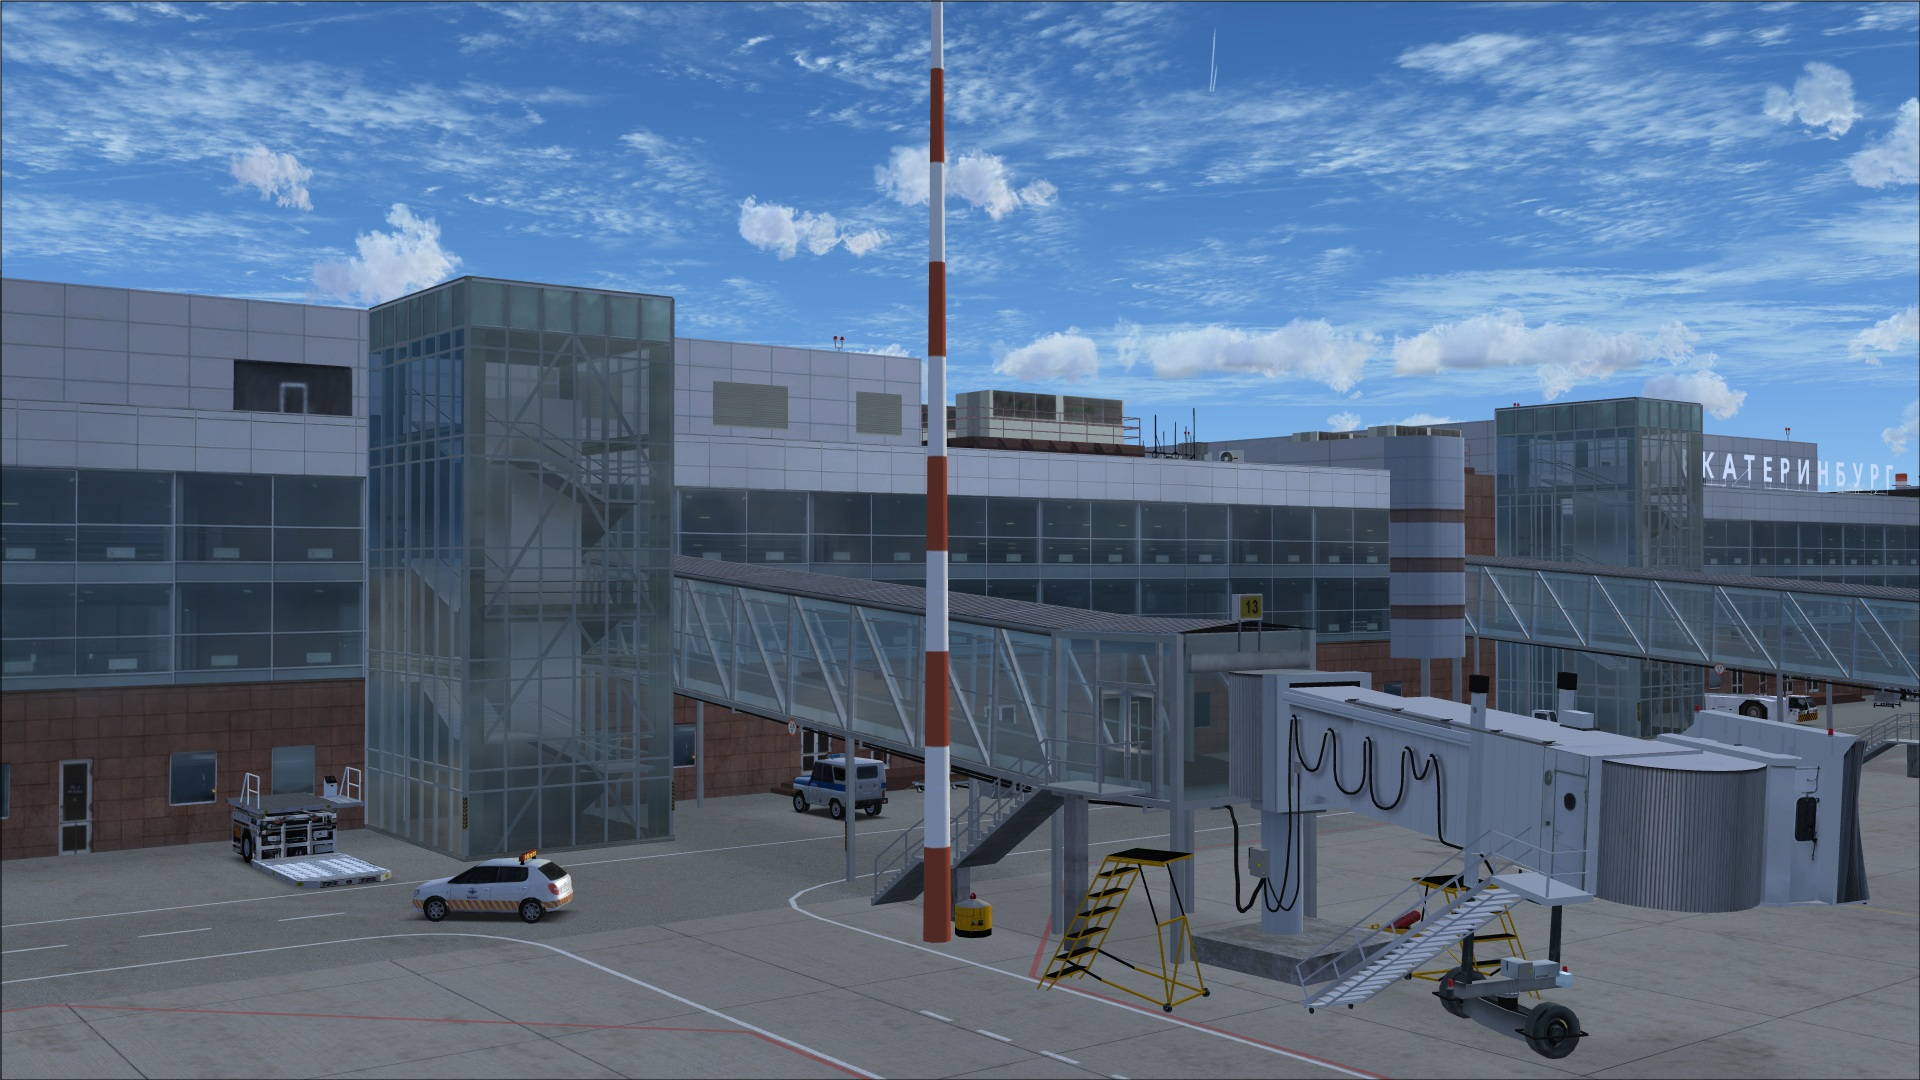 Review Of Aerosoft Yekaterinburg X For Fsx